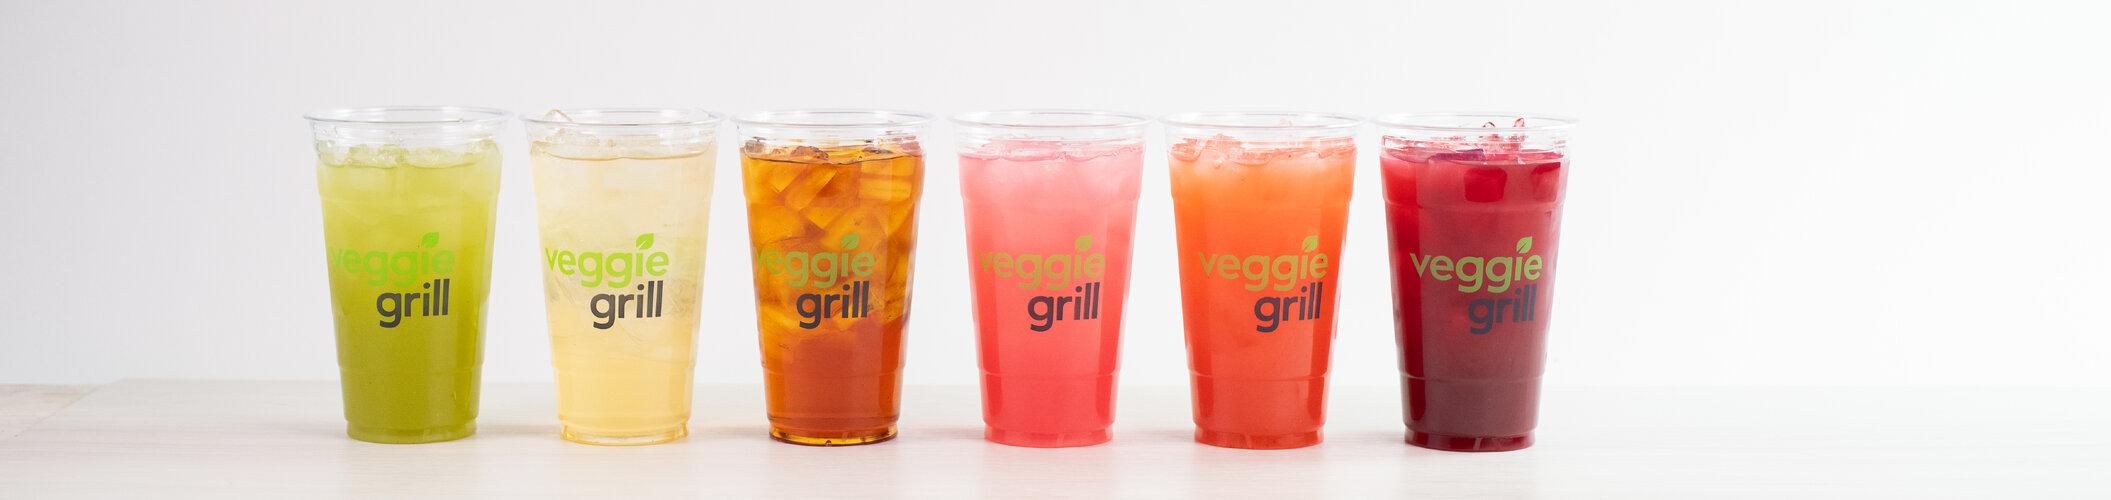 Handcrafted Beverage